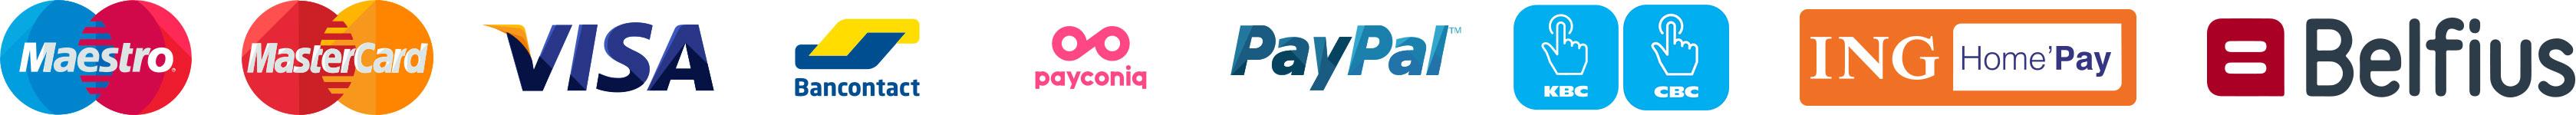 page_payments_methodslist_line